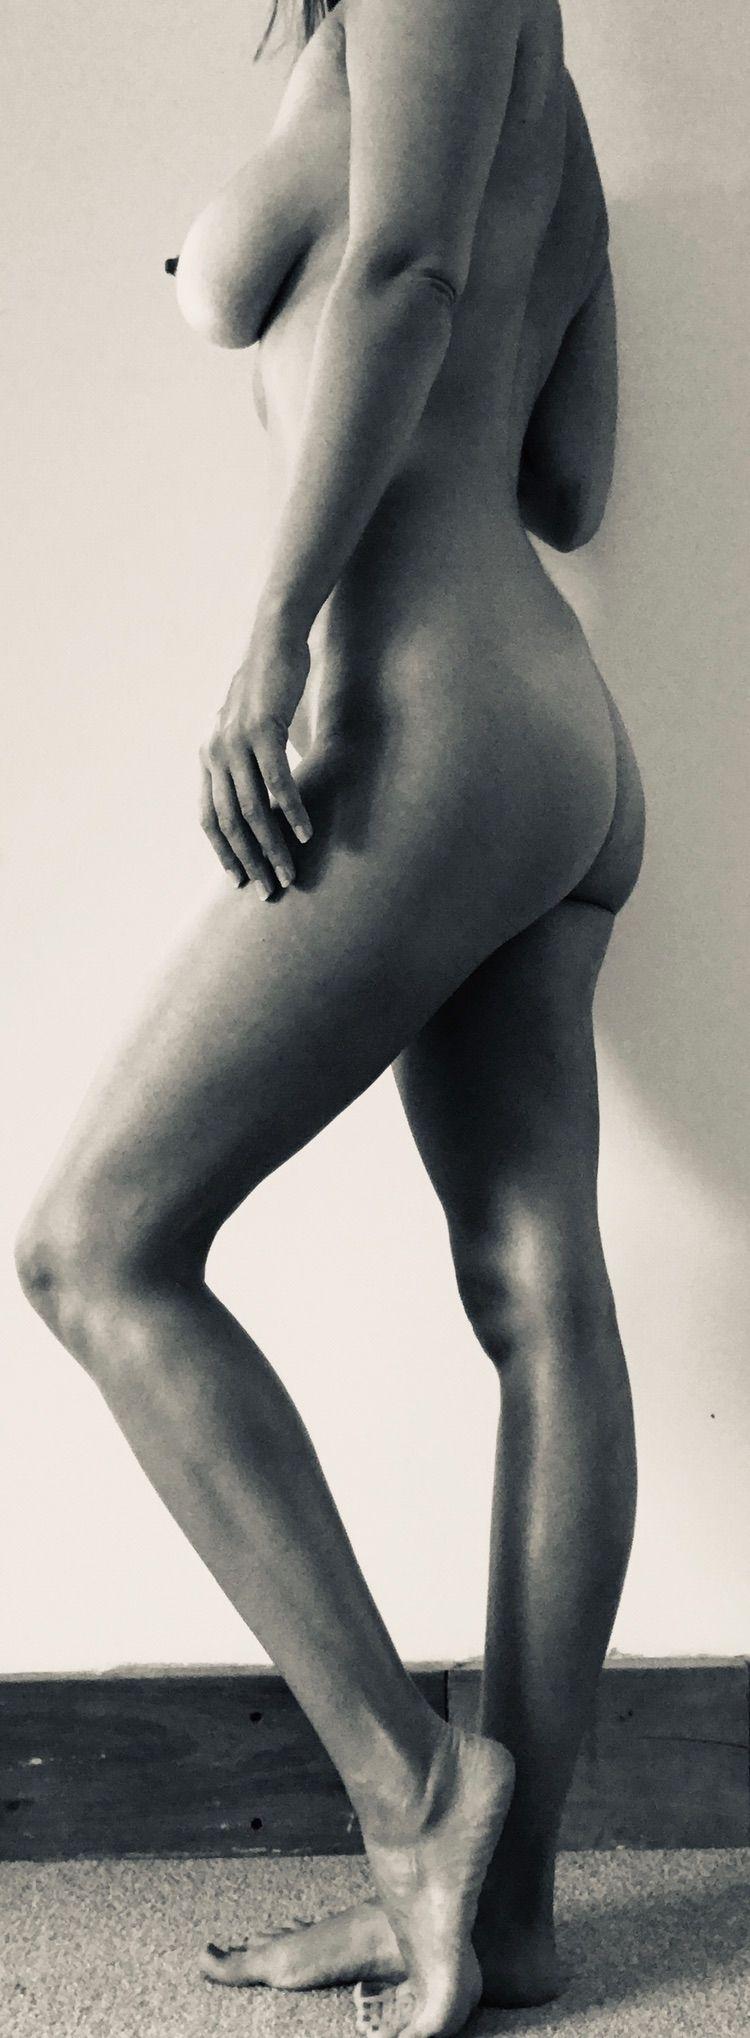 Sideways - nsfw, ass, boobs, legs - hulatallulah | ello